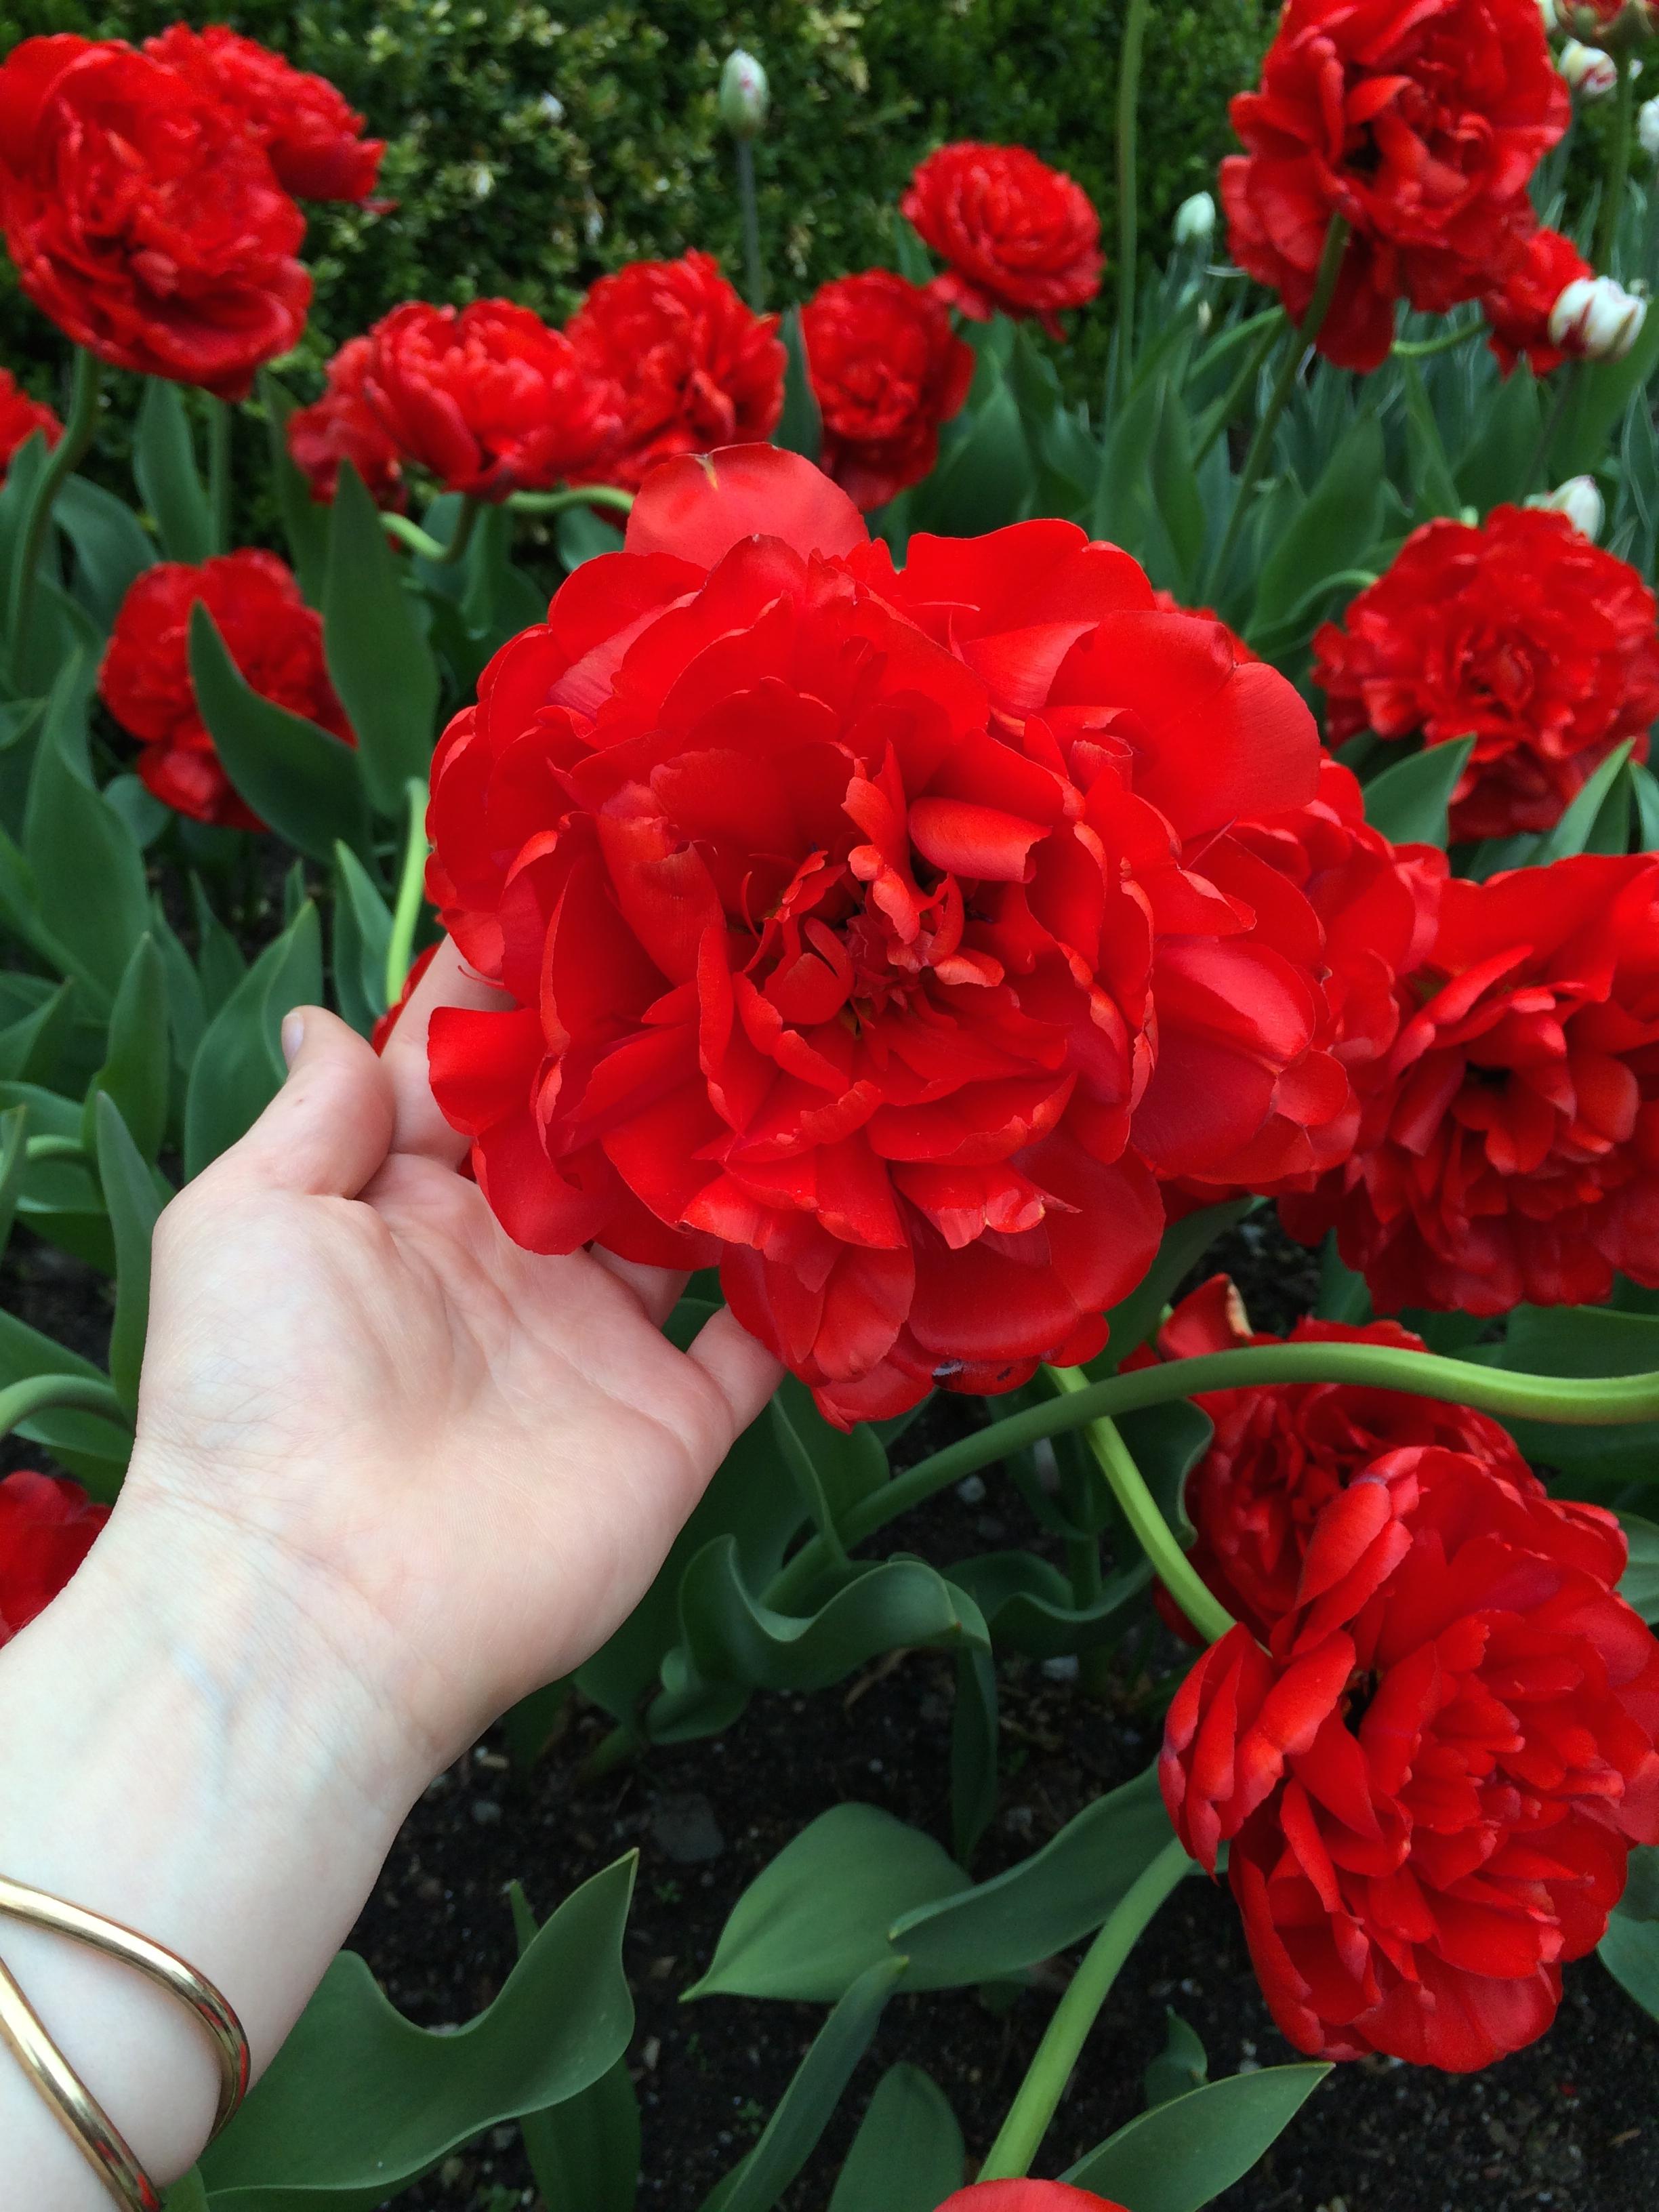 The reddest tulips I've ever seen.